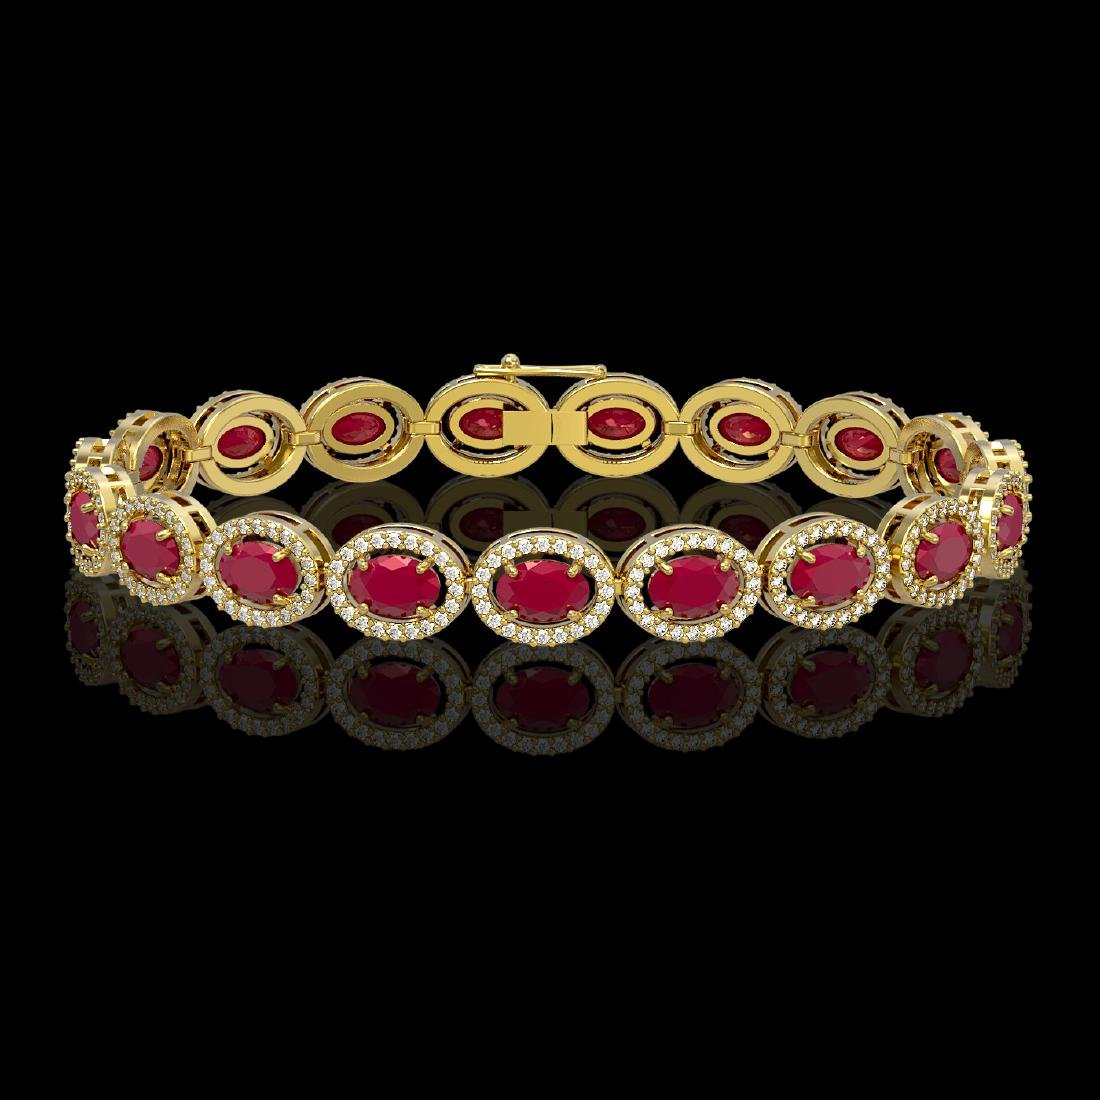 15.2 CTW Ruby & Diamond Halo Bracelet 10K Yellow Gold